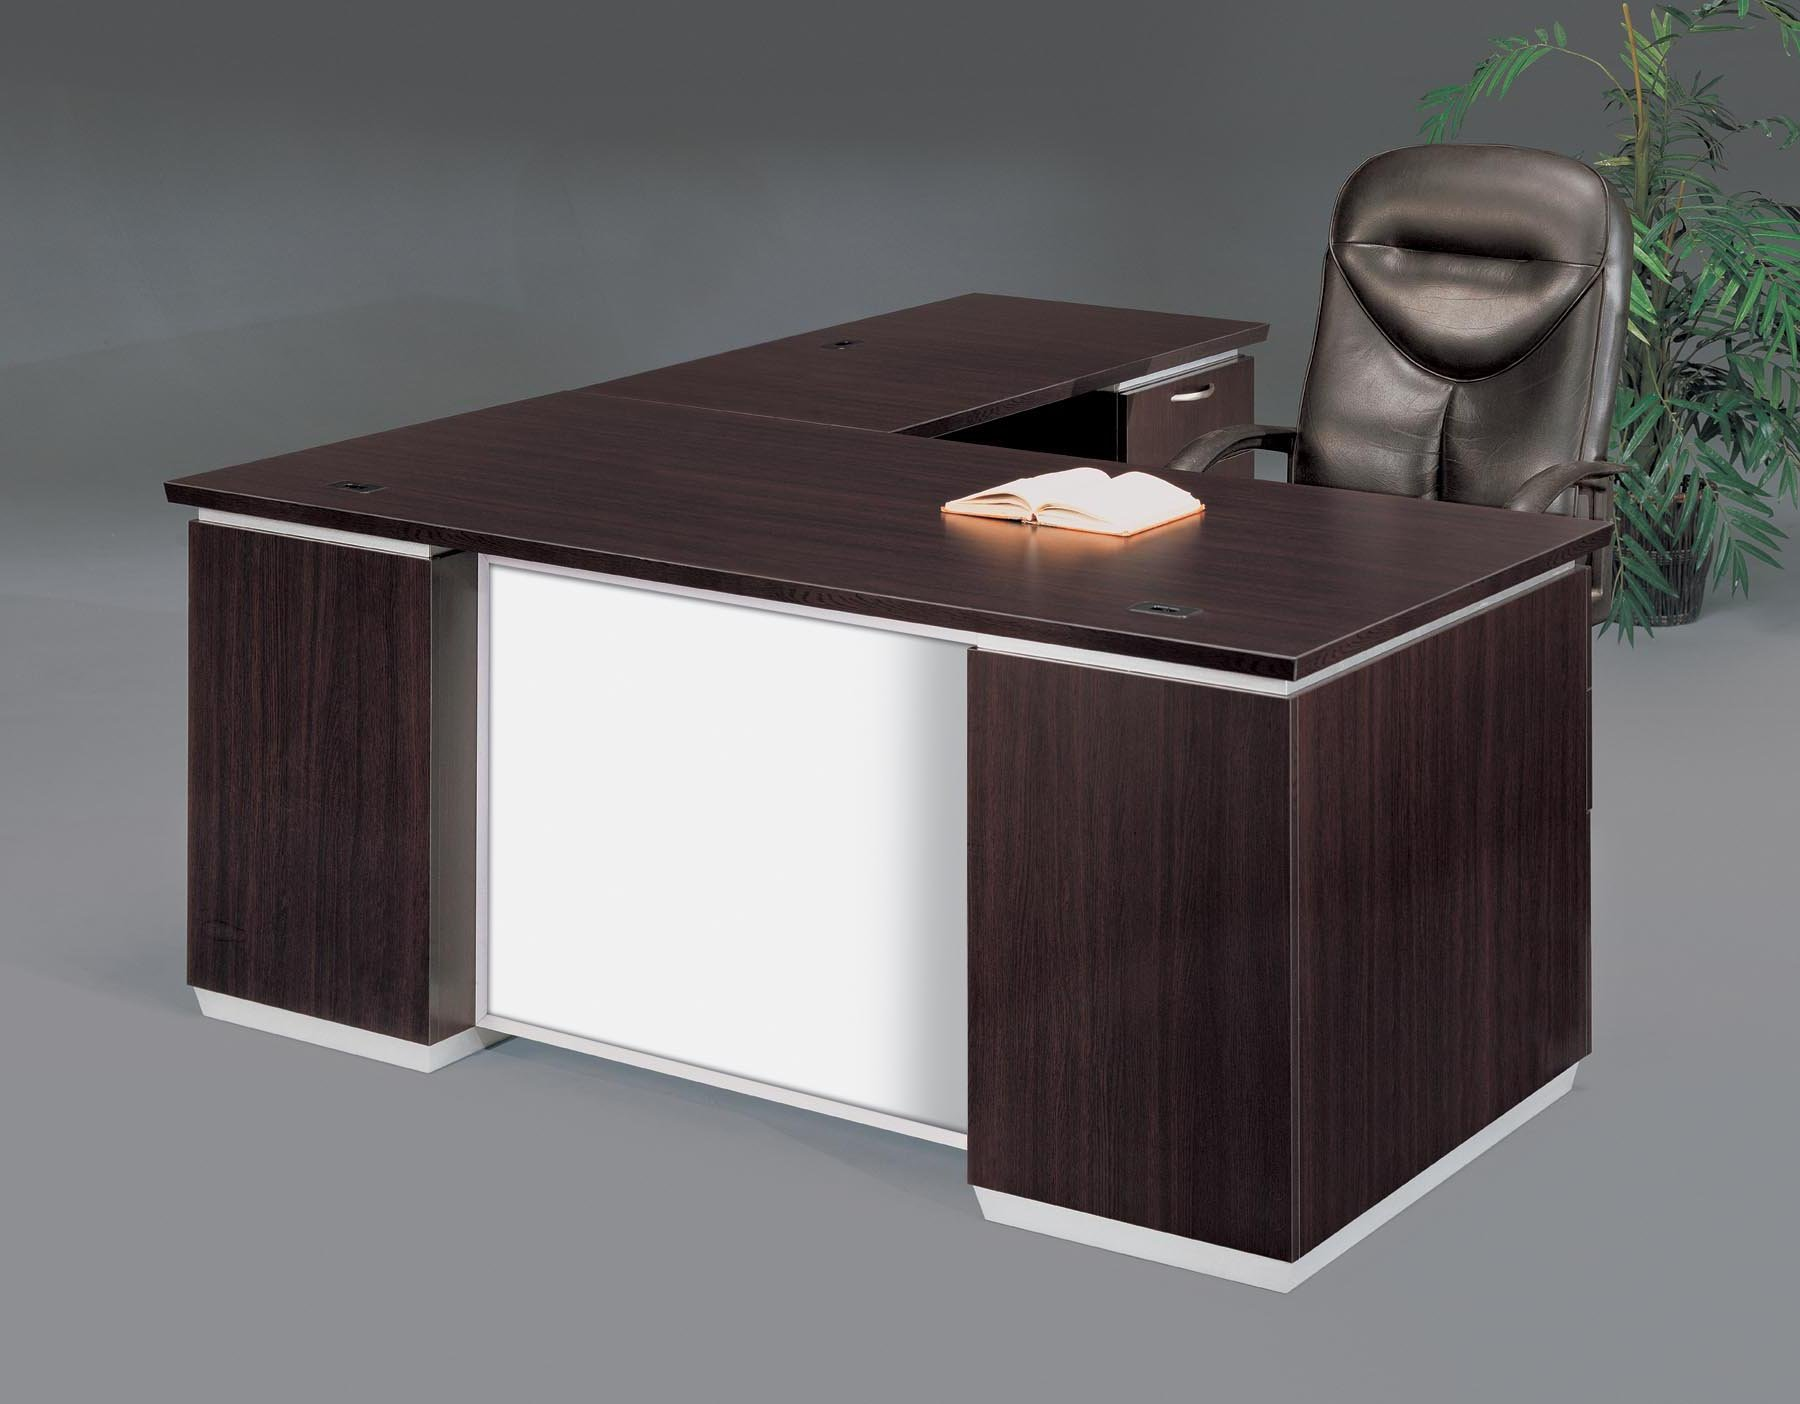 Flexsteel Pimlico  Right Executive L Desk with White Glass Modesty Panel